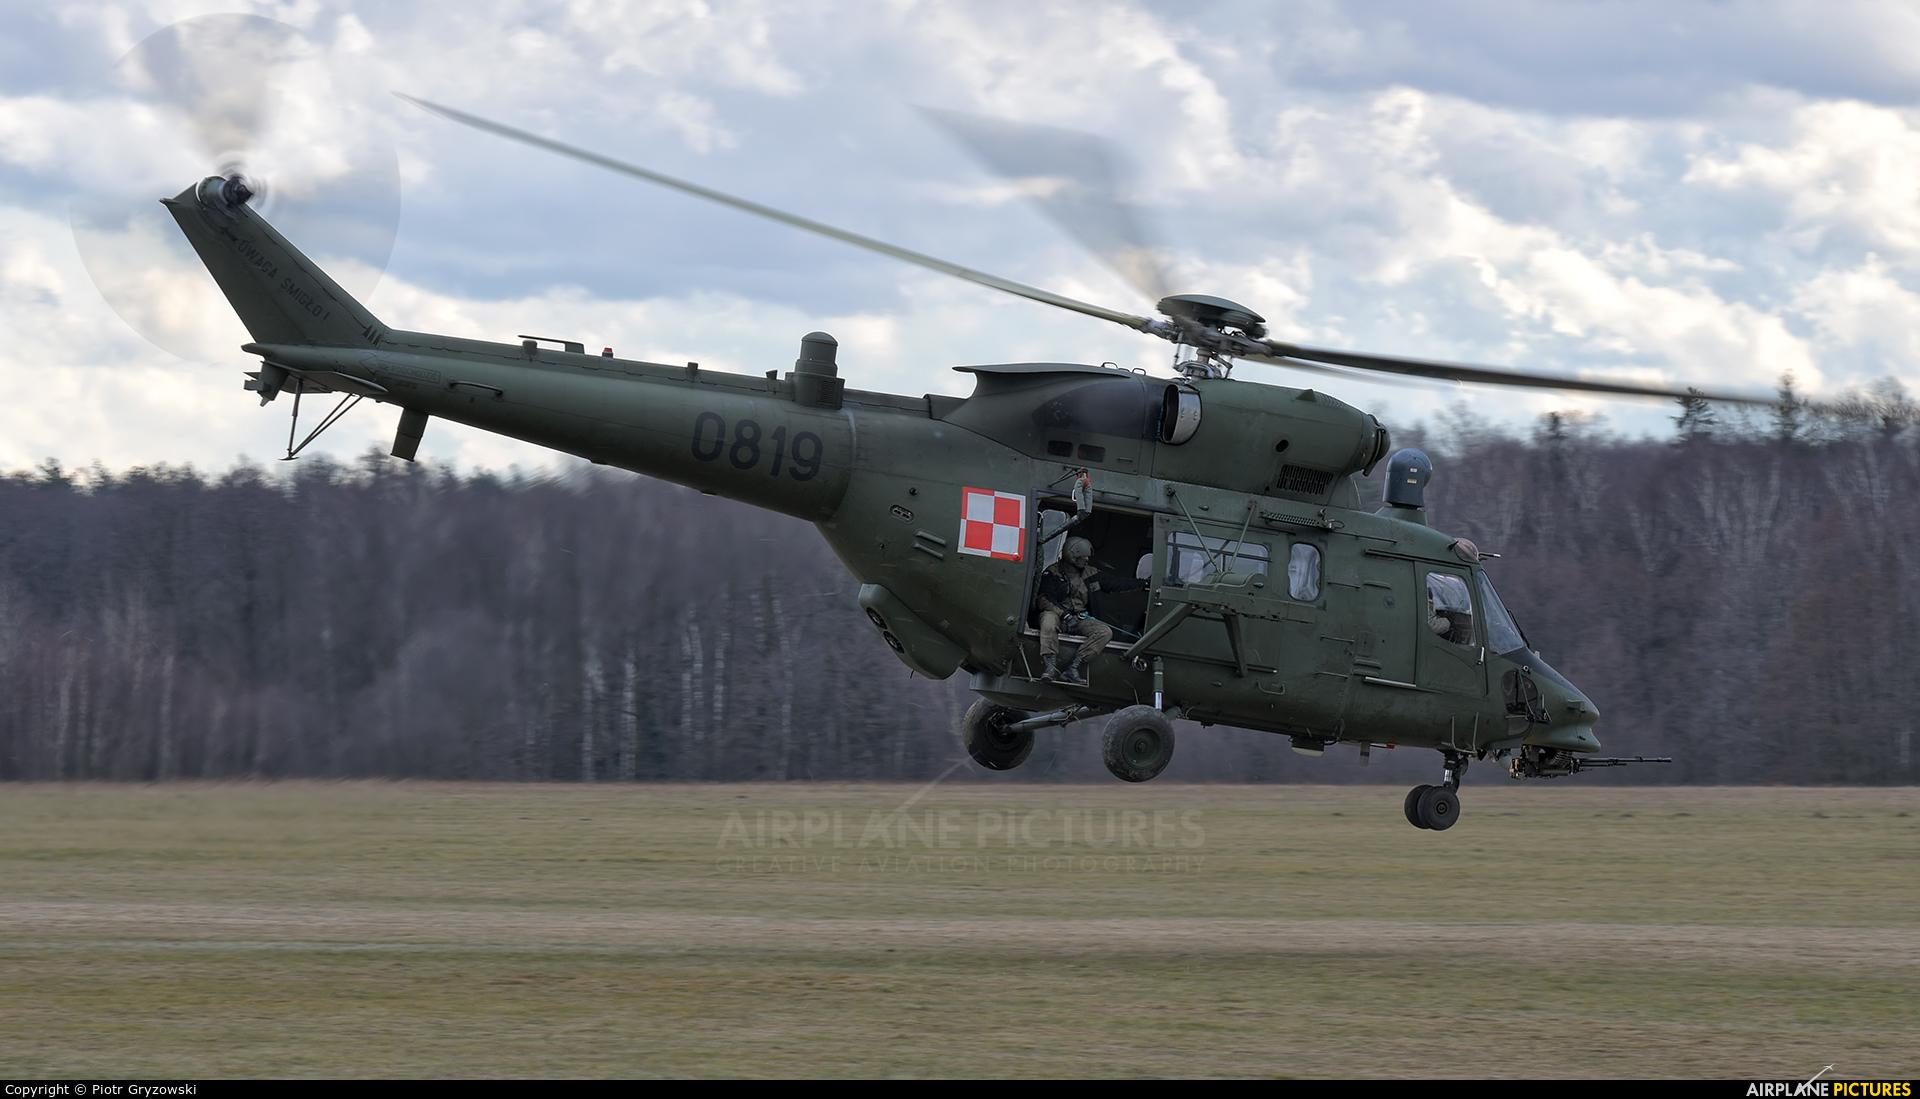 Poland - Army 0819 aircraft at Rybnik - Gotartowice